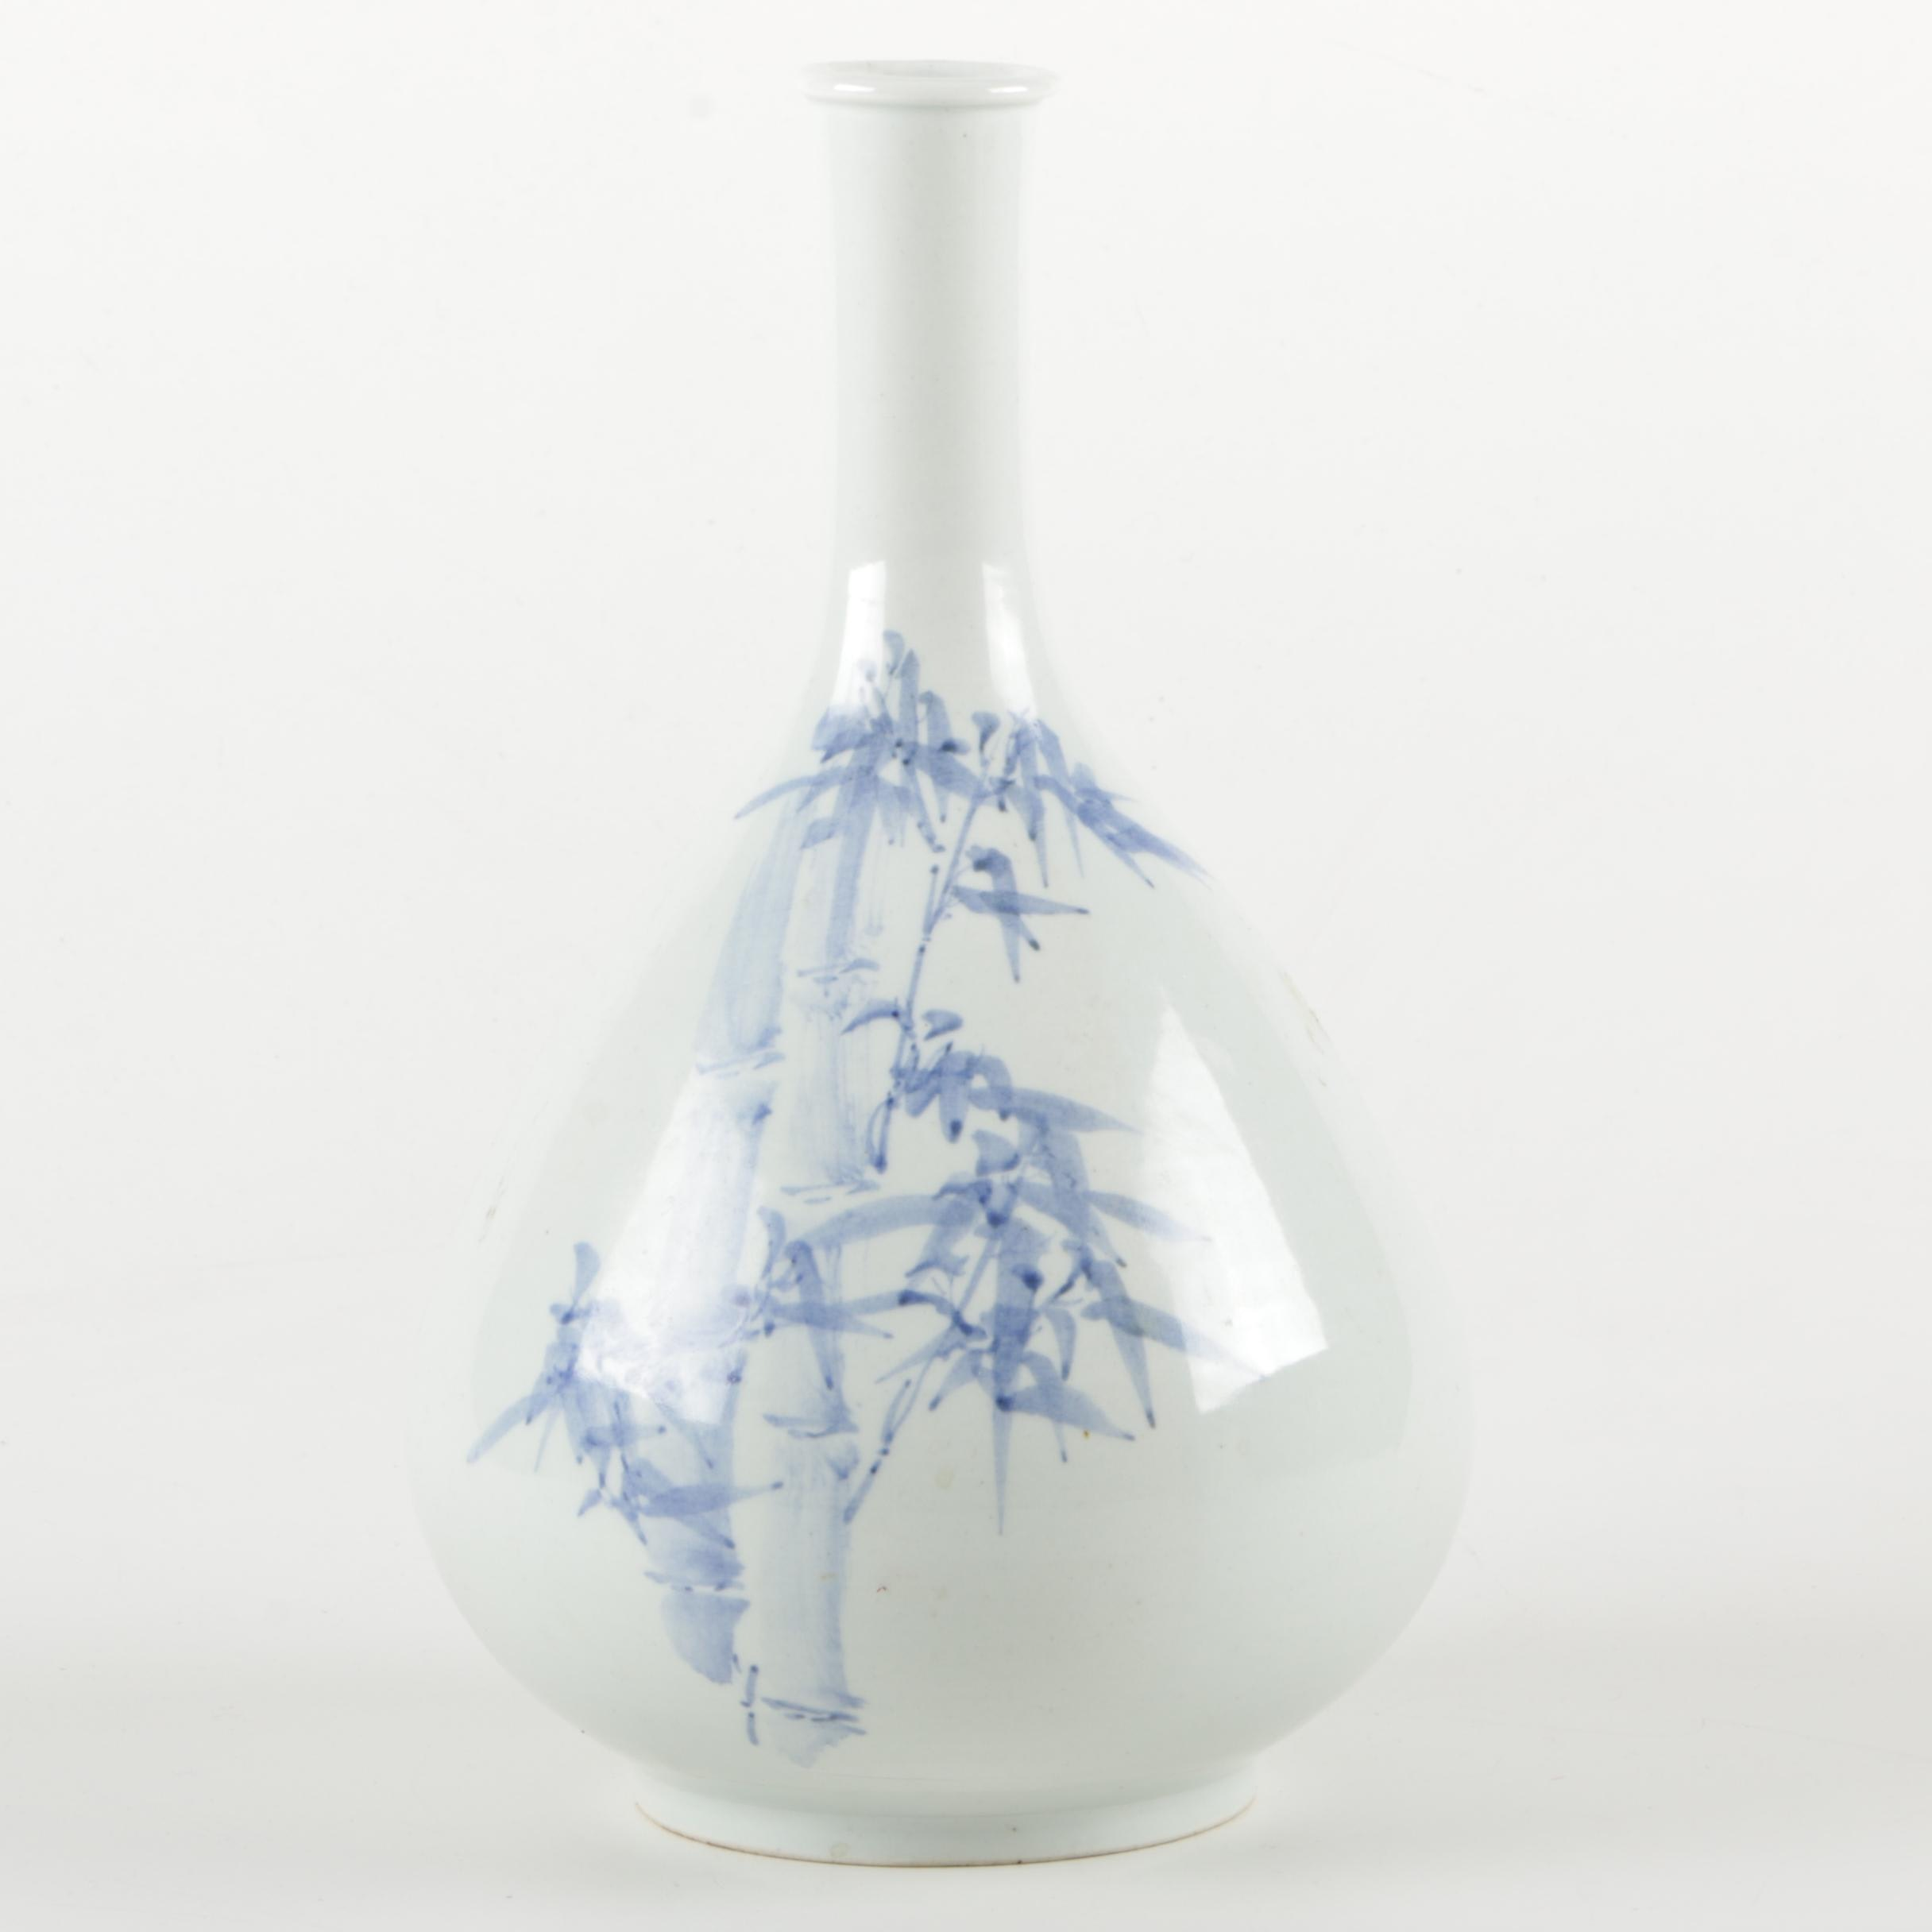 Japanese Ceramic Bud Vase